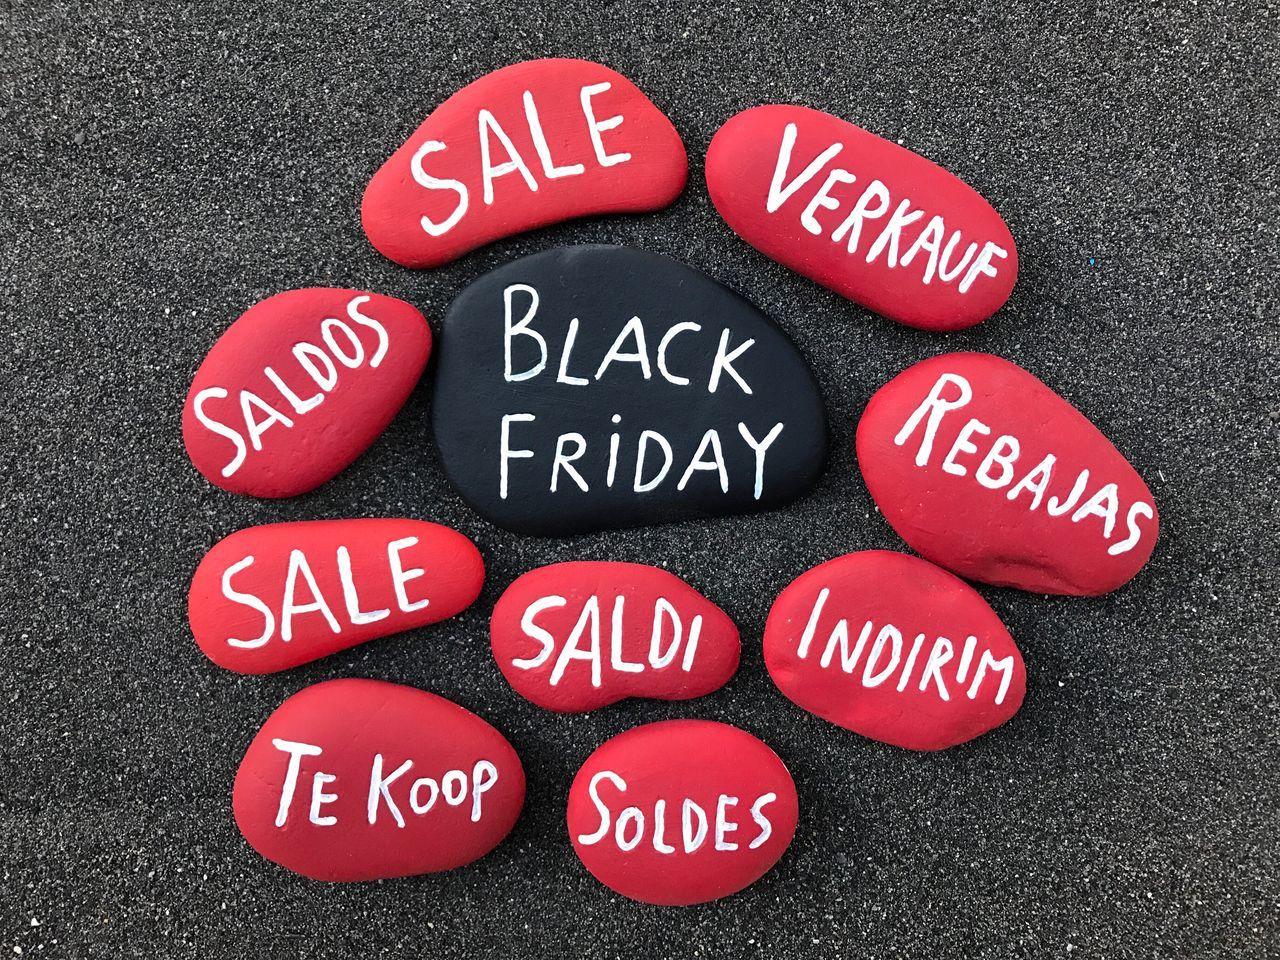 Black Friday concept Yournameonstones Promotion Sold Soldes Saldi Shopping Business Commerce Sale Black Friday Art Work Stones